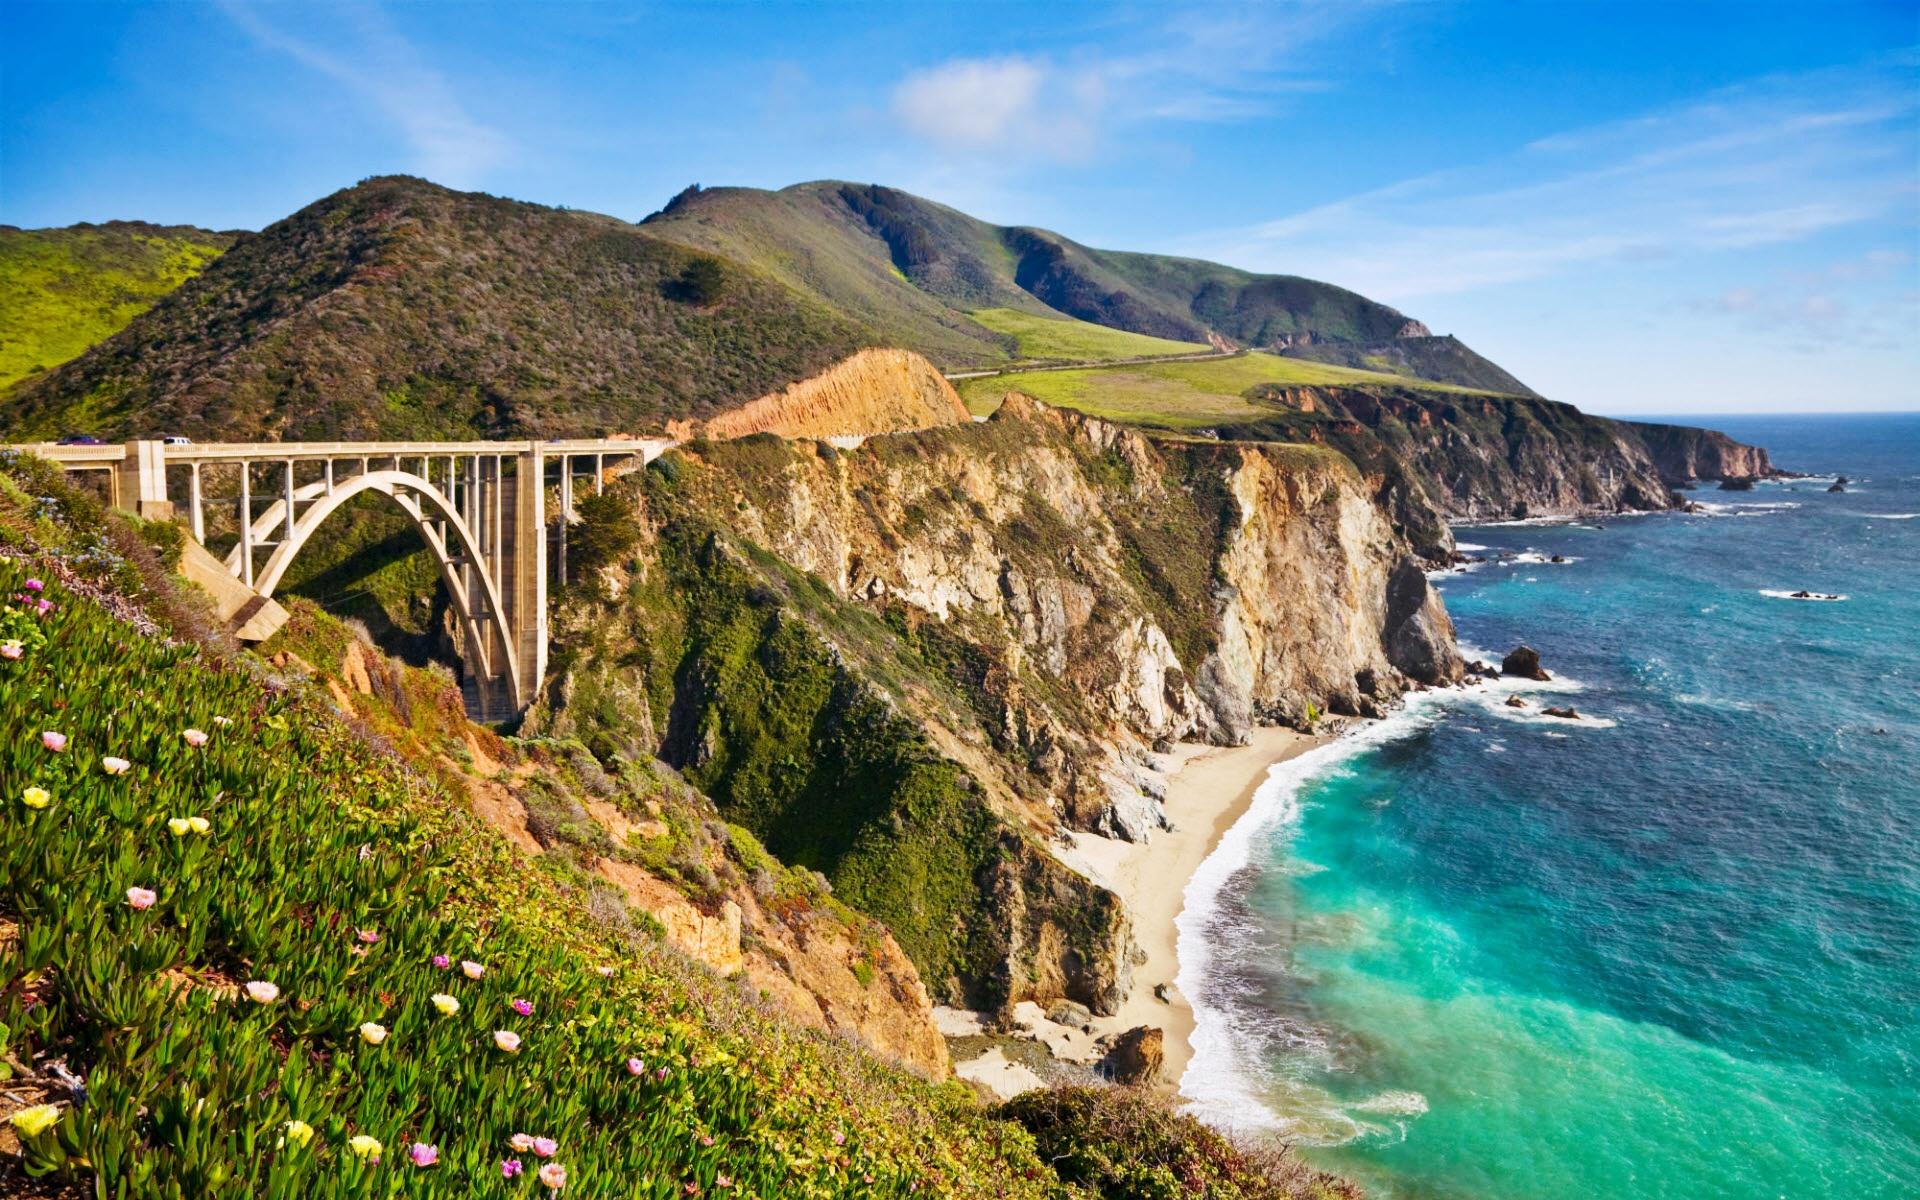 Bixby Bridge in Big Sur California Wallpapers HD Wallpapers 1920x1200